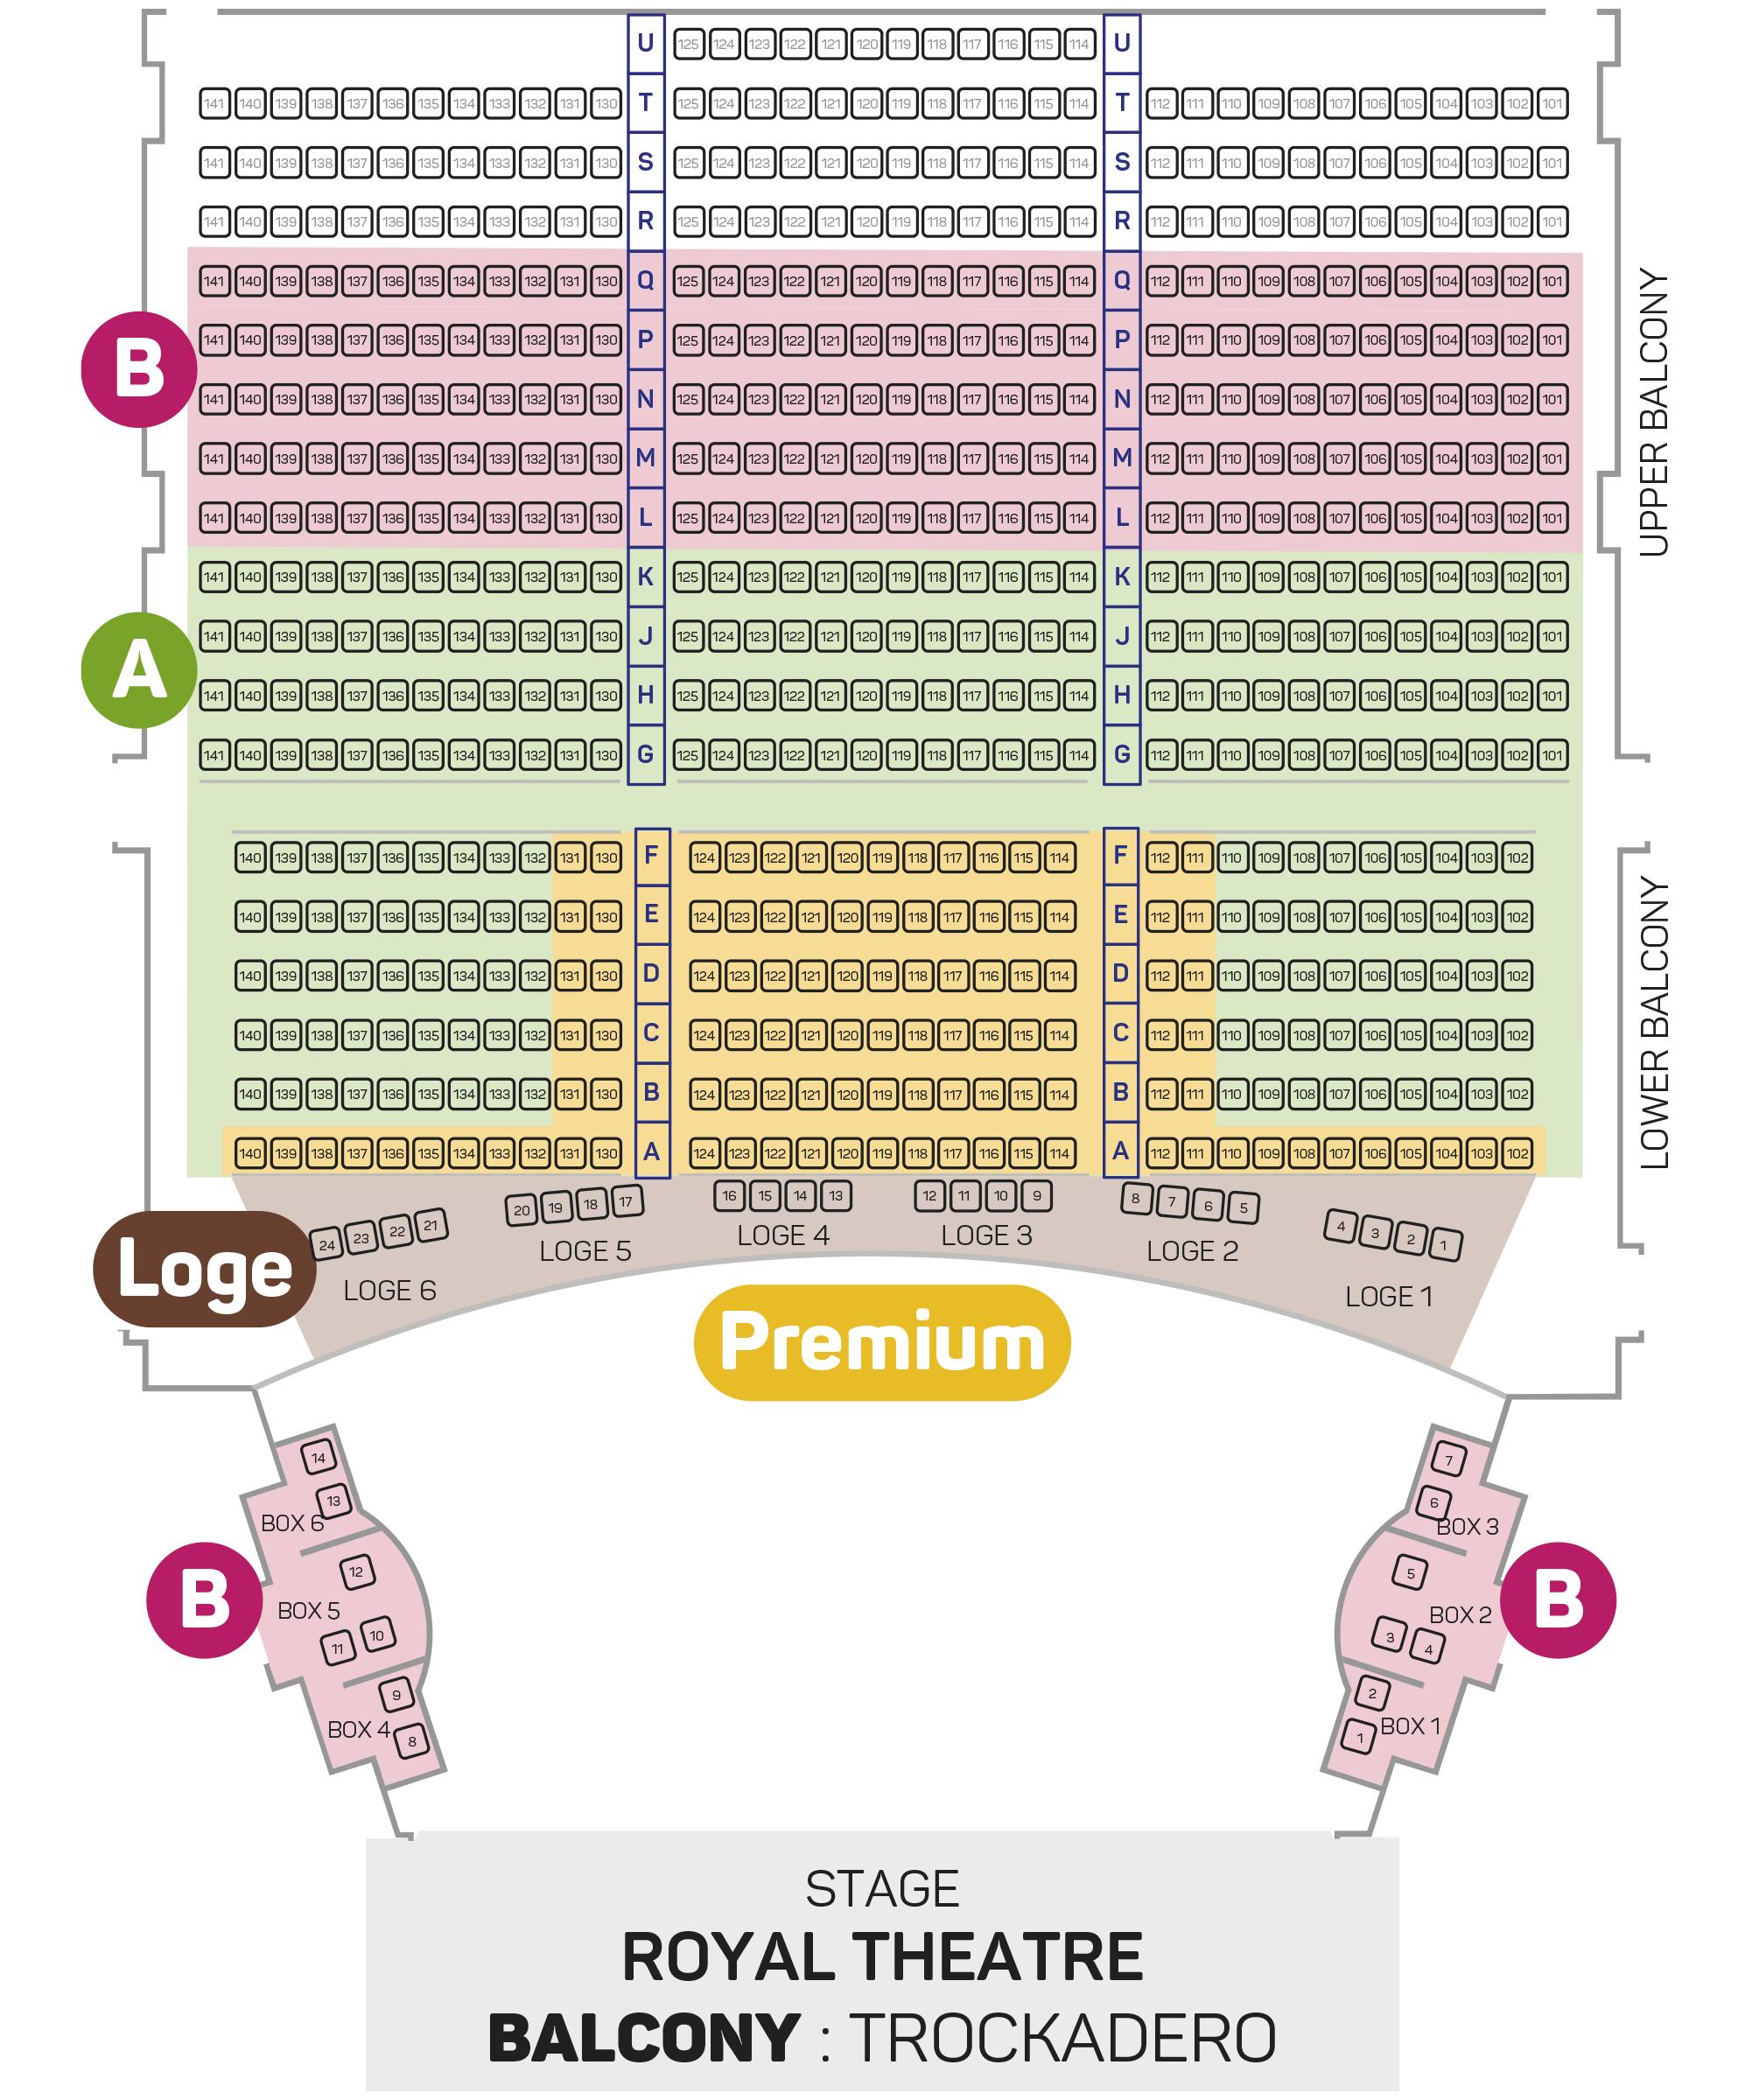 Les Ballets Trockadero Seating Plan - Balcony